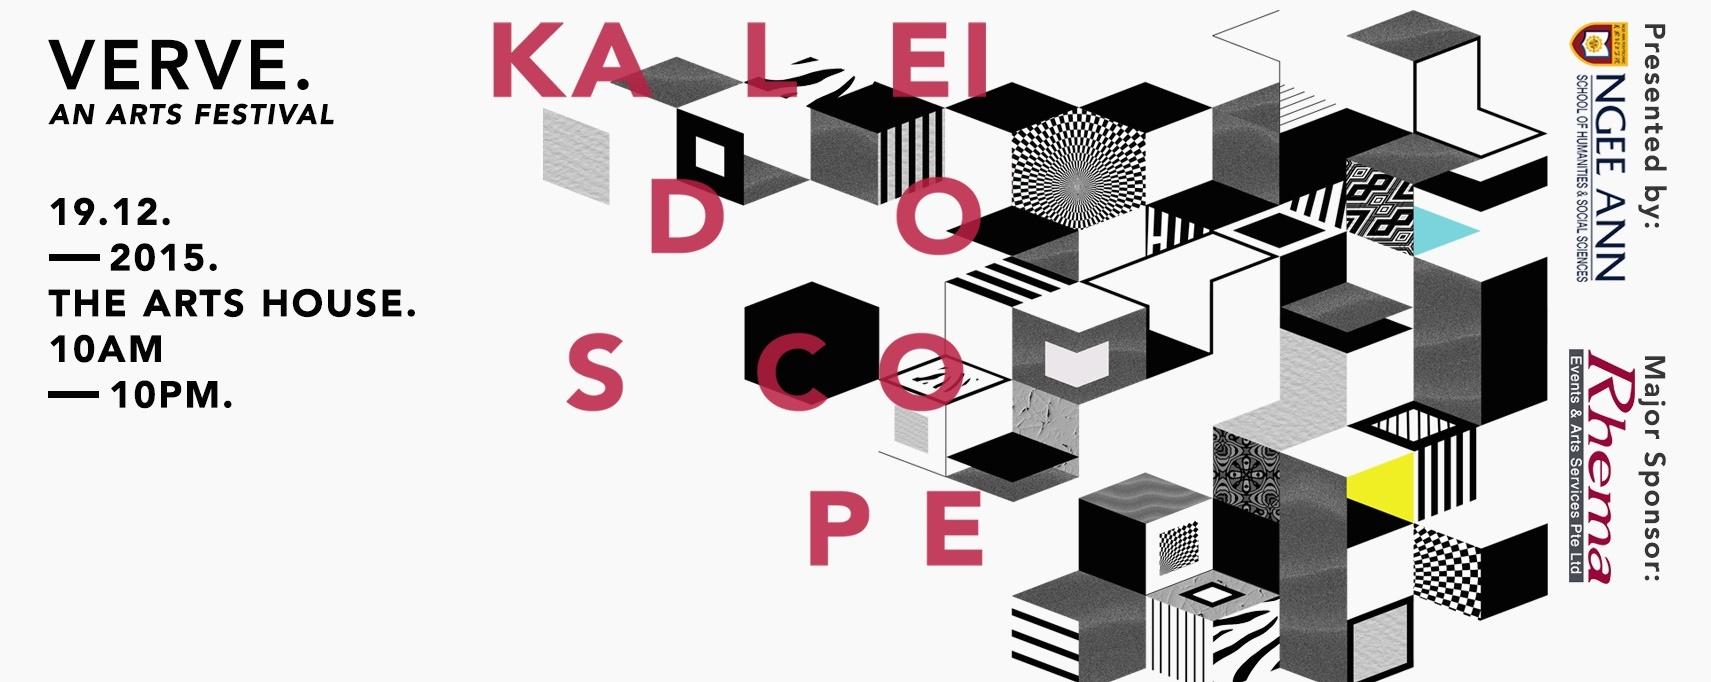 Verve Arts Festival '15: Kaleidoscope